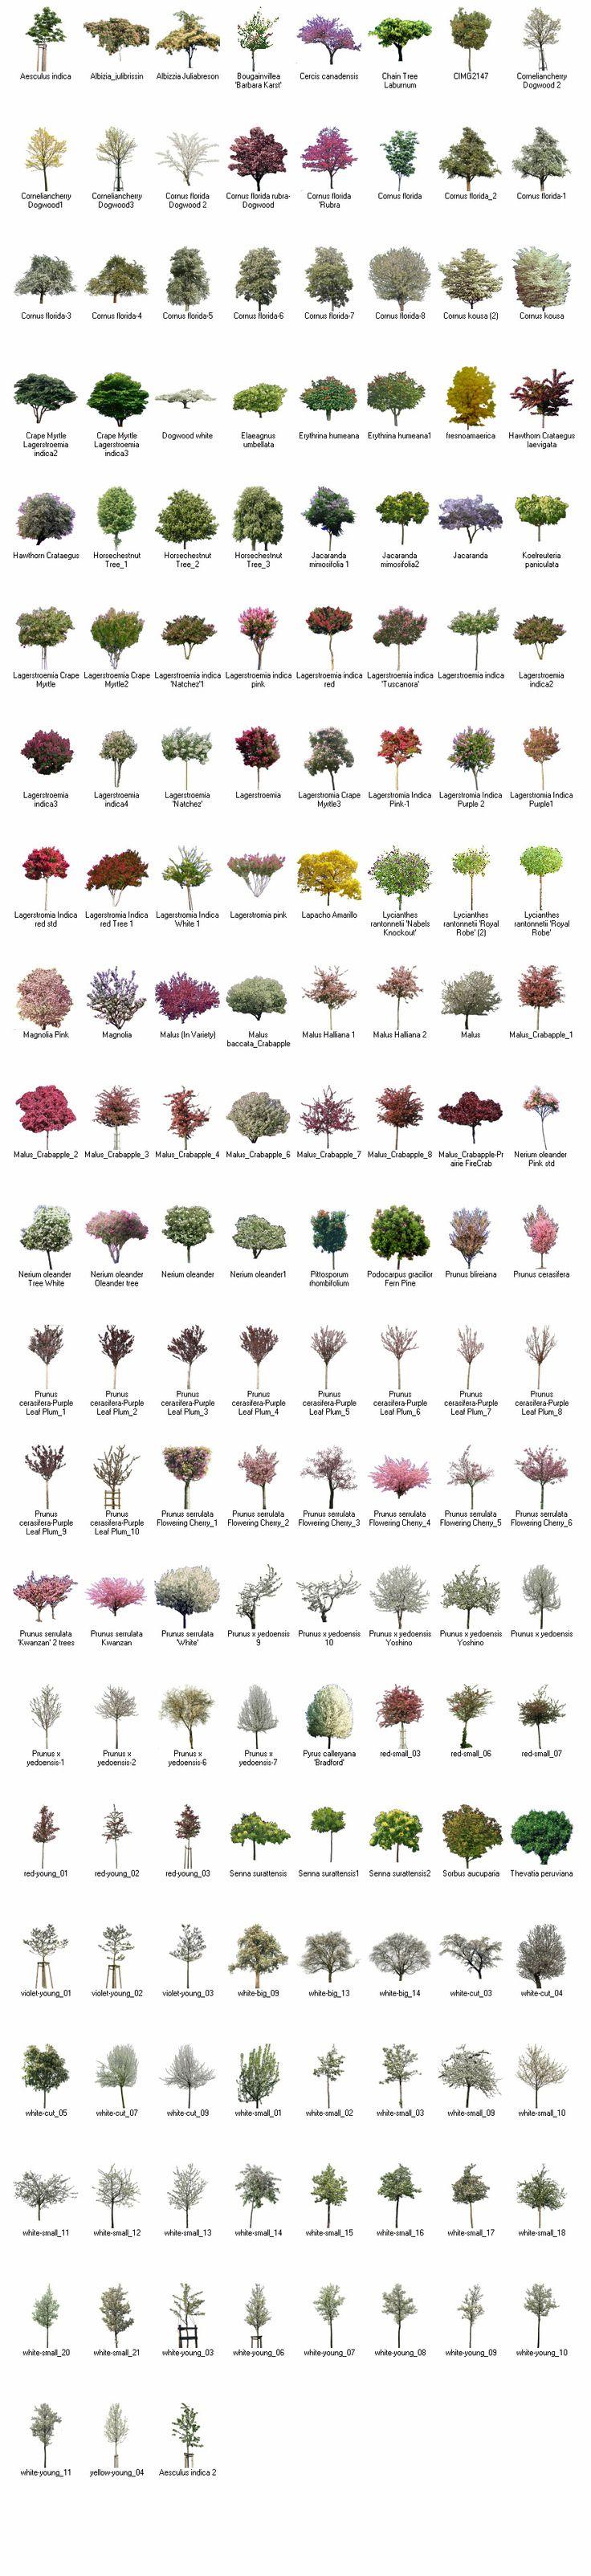 best 25 landscaping software ideas on pinterest free landscape flowering trees for landscape design using greenscapes landscape design imaging software learn more http